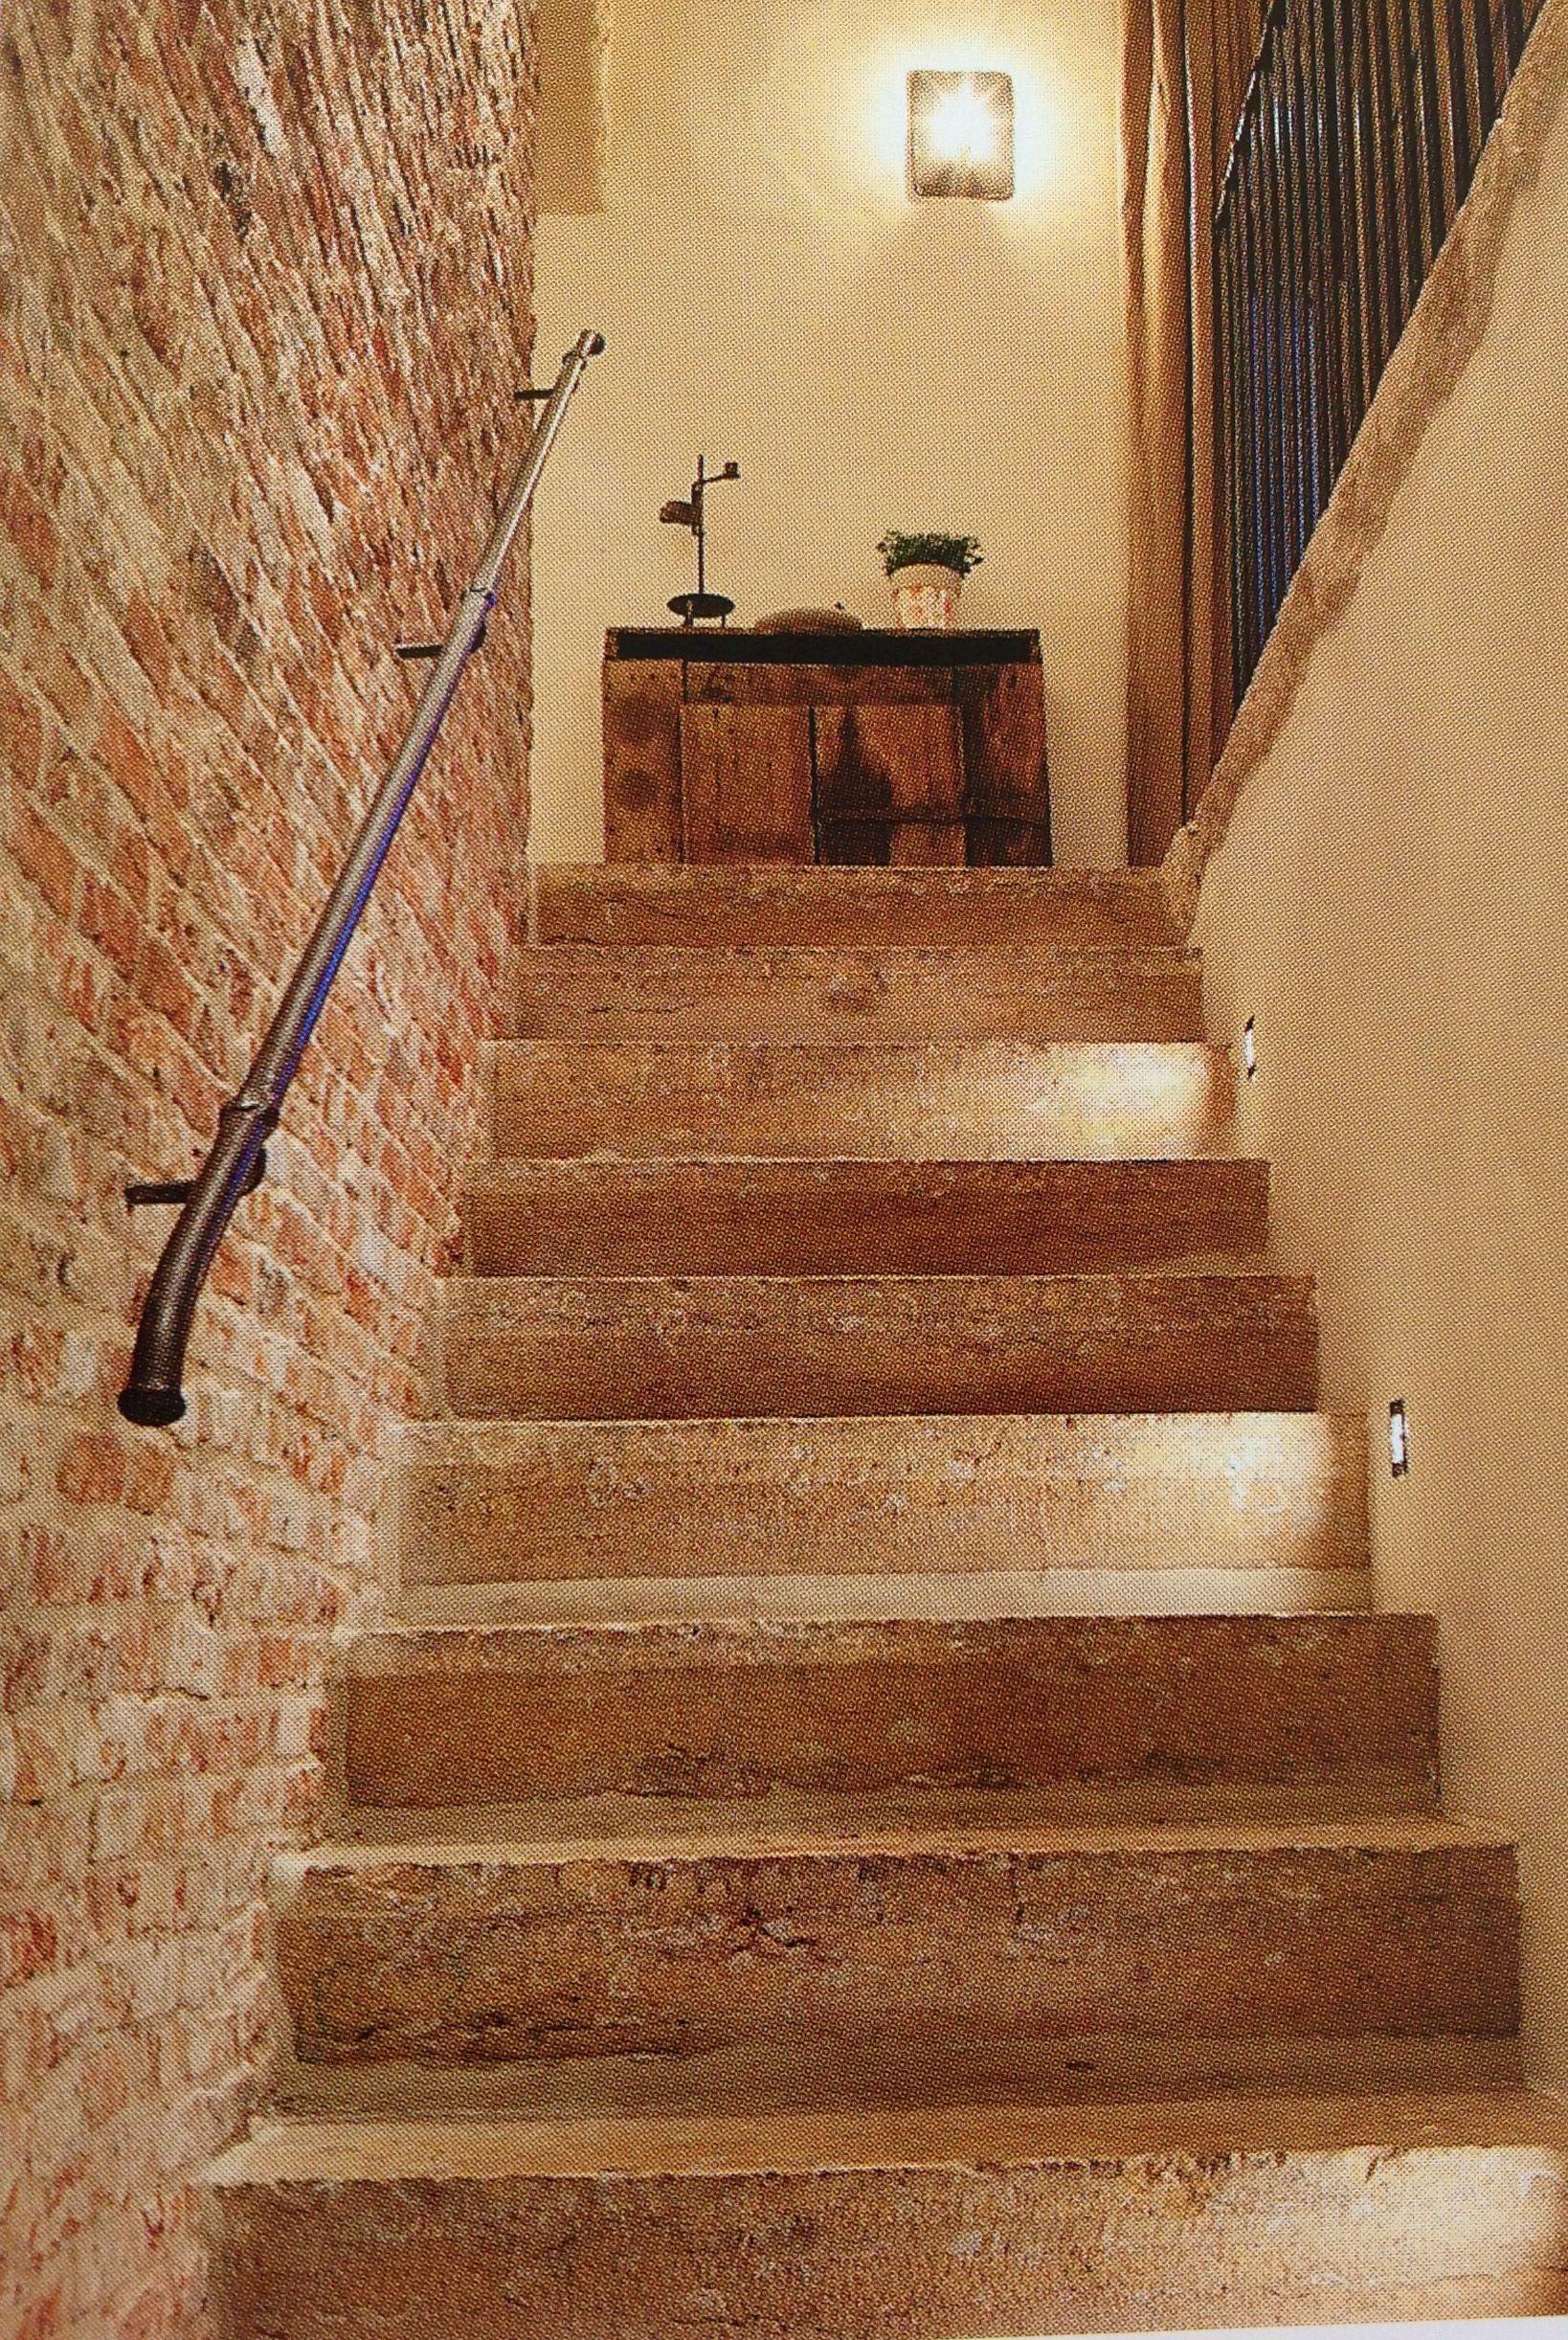 Beta Plus Stone Stairway Brick Wall Simple Iron Stair Rail Interior Details In 2019 | Installing Railing On Stone Steps